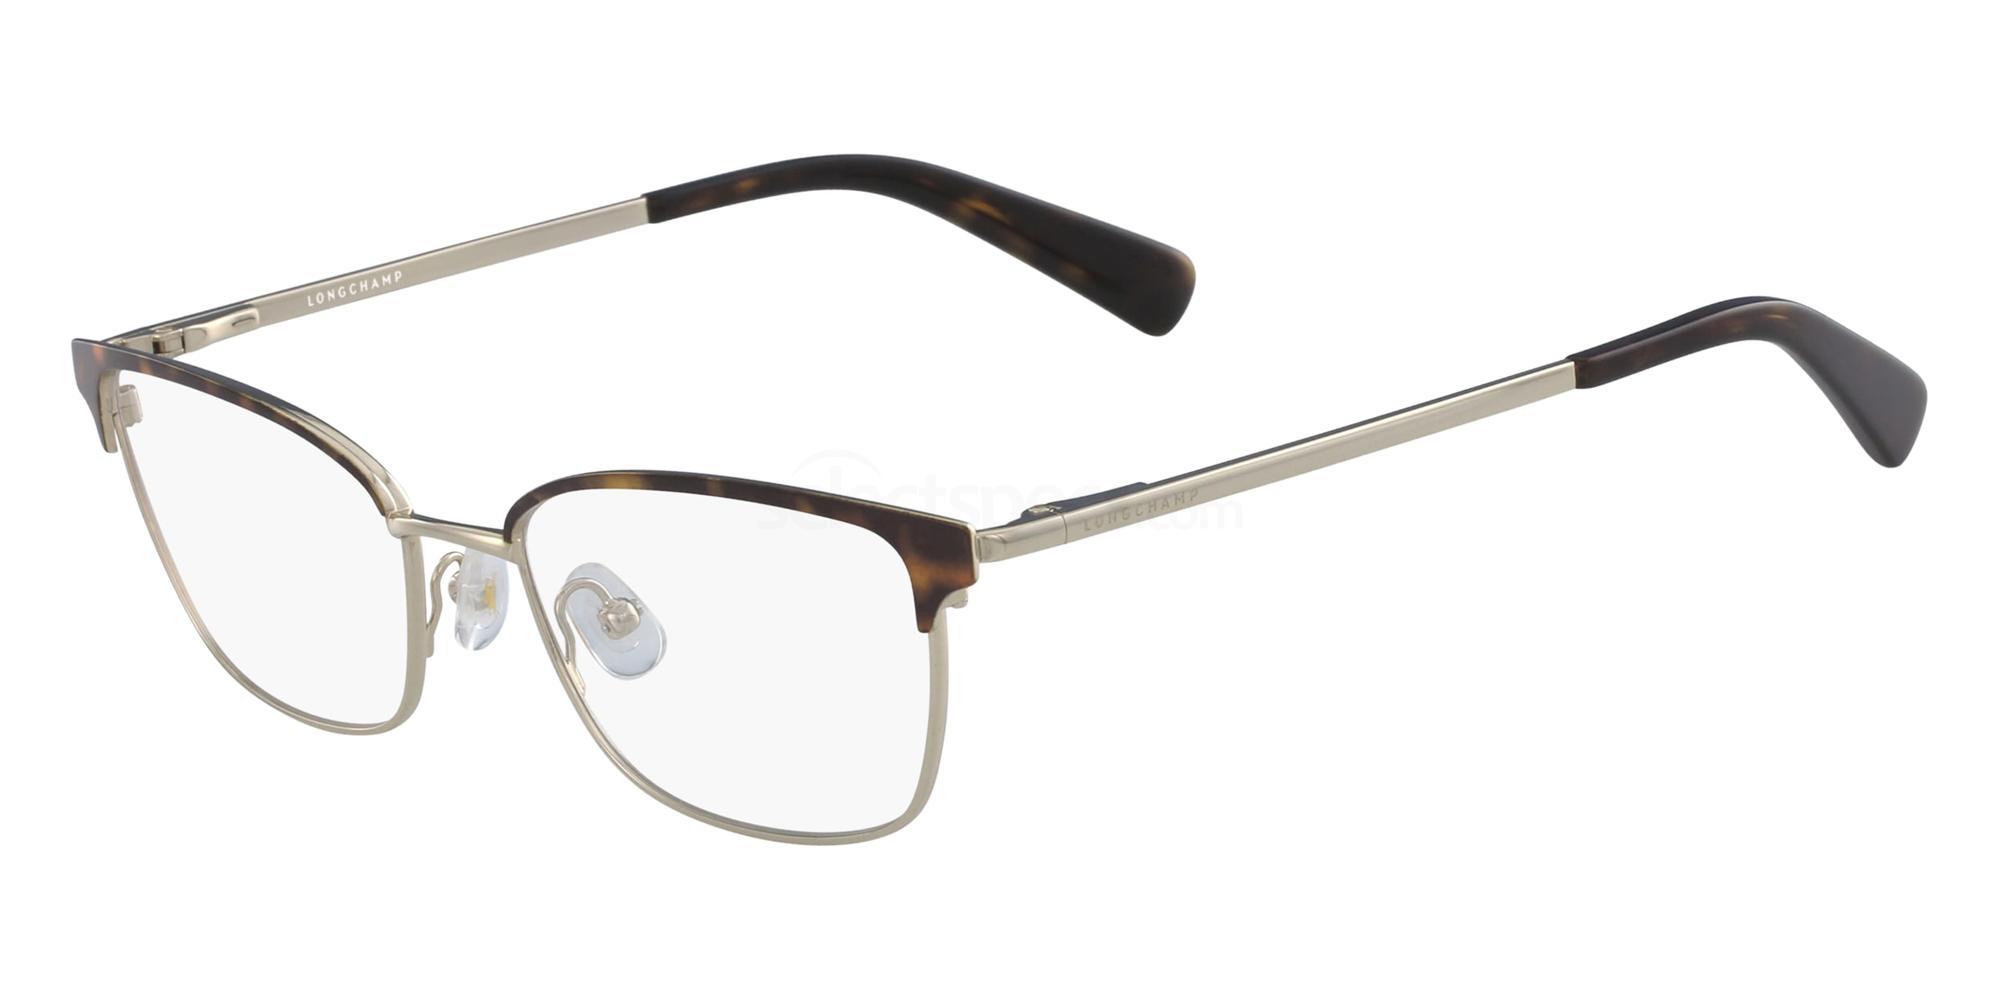 214 LO2102 Glasses, LONGCHAMP